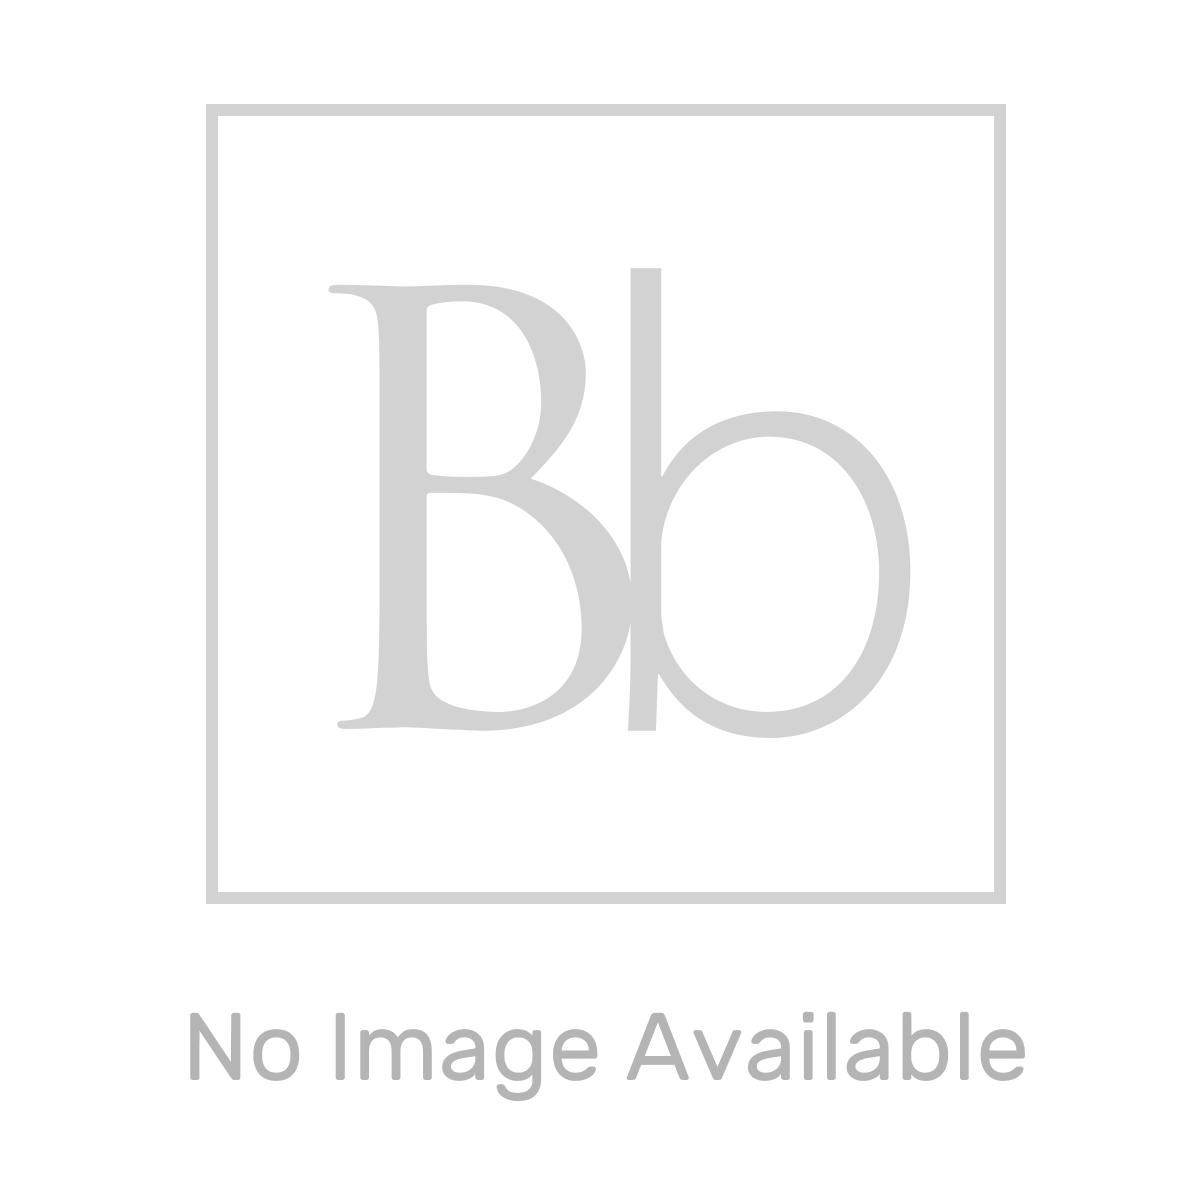 RAK Chrome Square Shower Handset with Bracket Kit Measurements